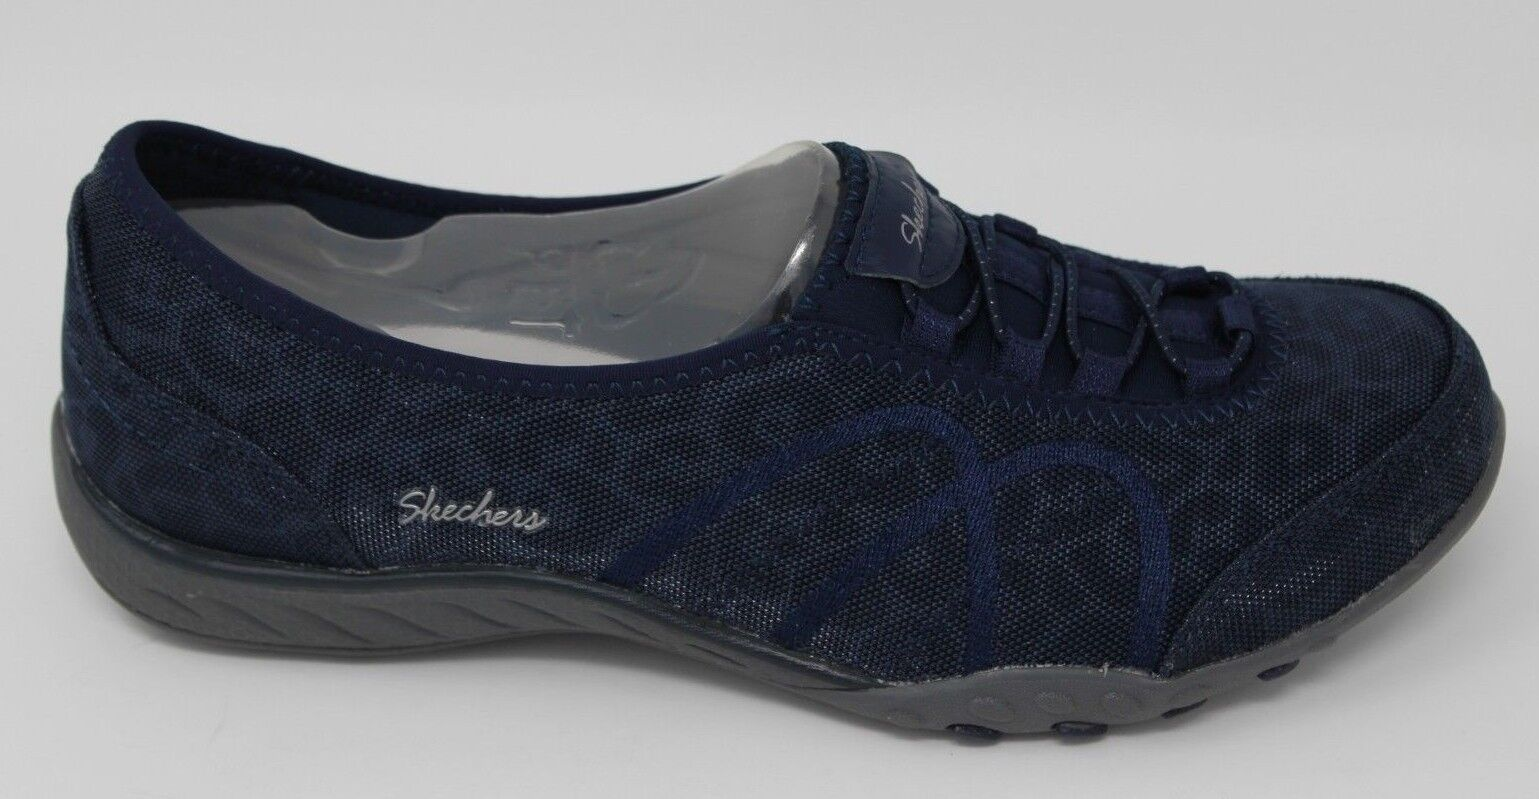 Skechers Donna Breathe-Easy-Bold Risk 23228 Navy Nuovo